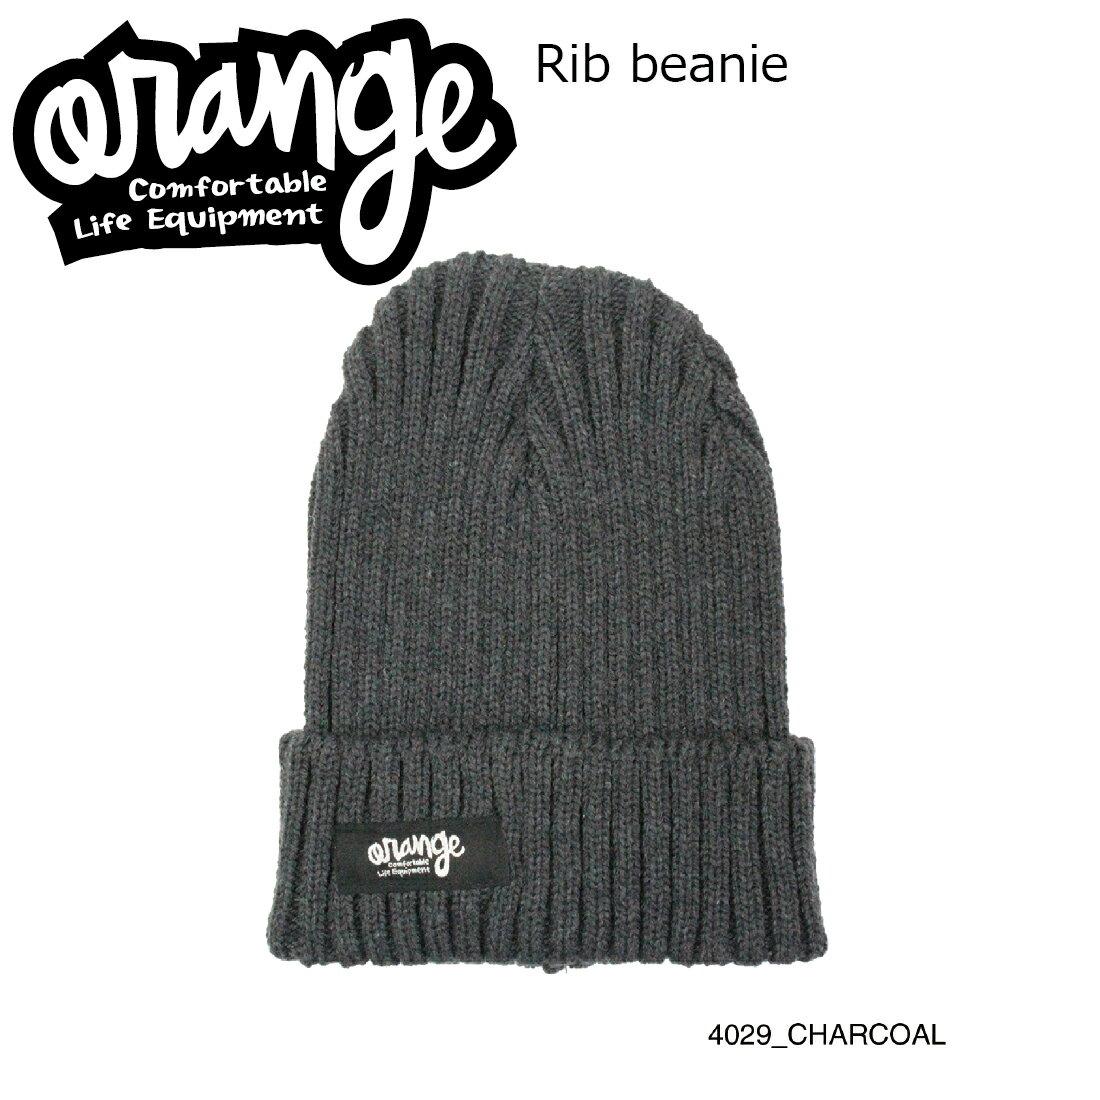 Oran'ge Rib Beanie 4029 CHARCOAL オレンジ リブ ビーニー ニットキャップ 2つ折り